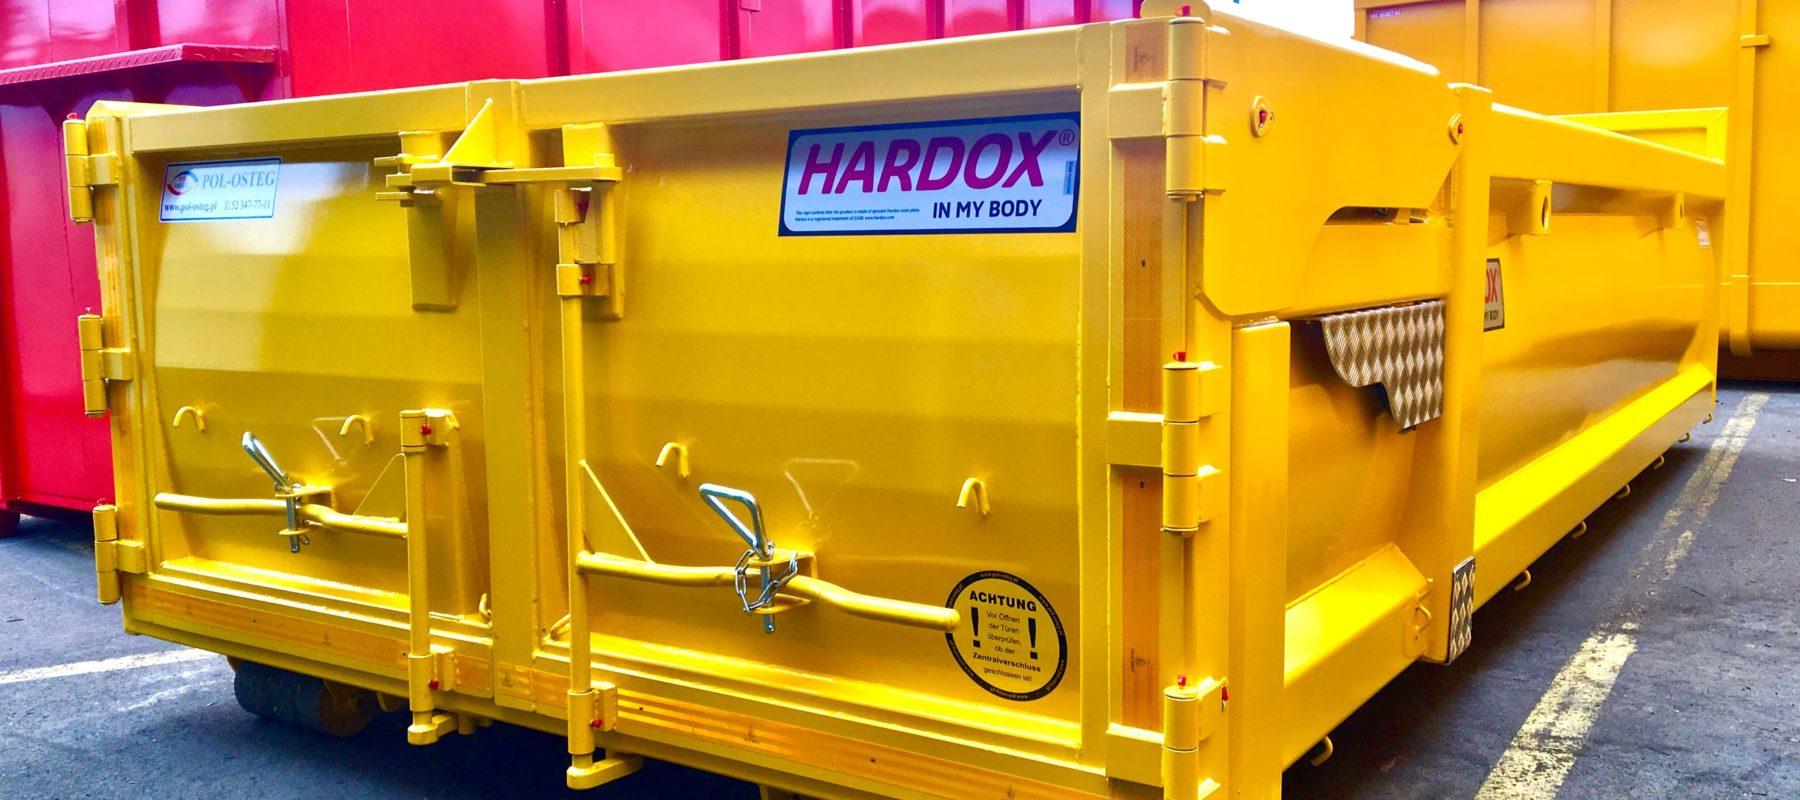 kontener stalowy HARDOX